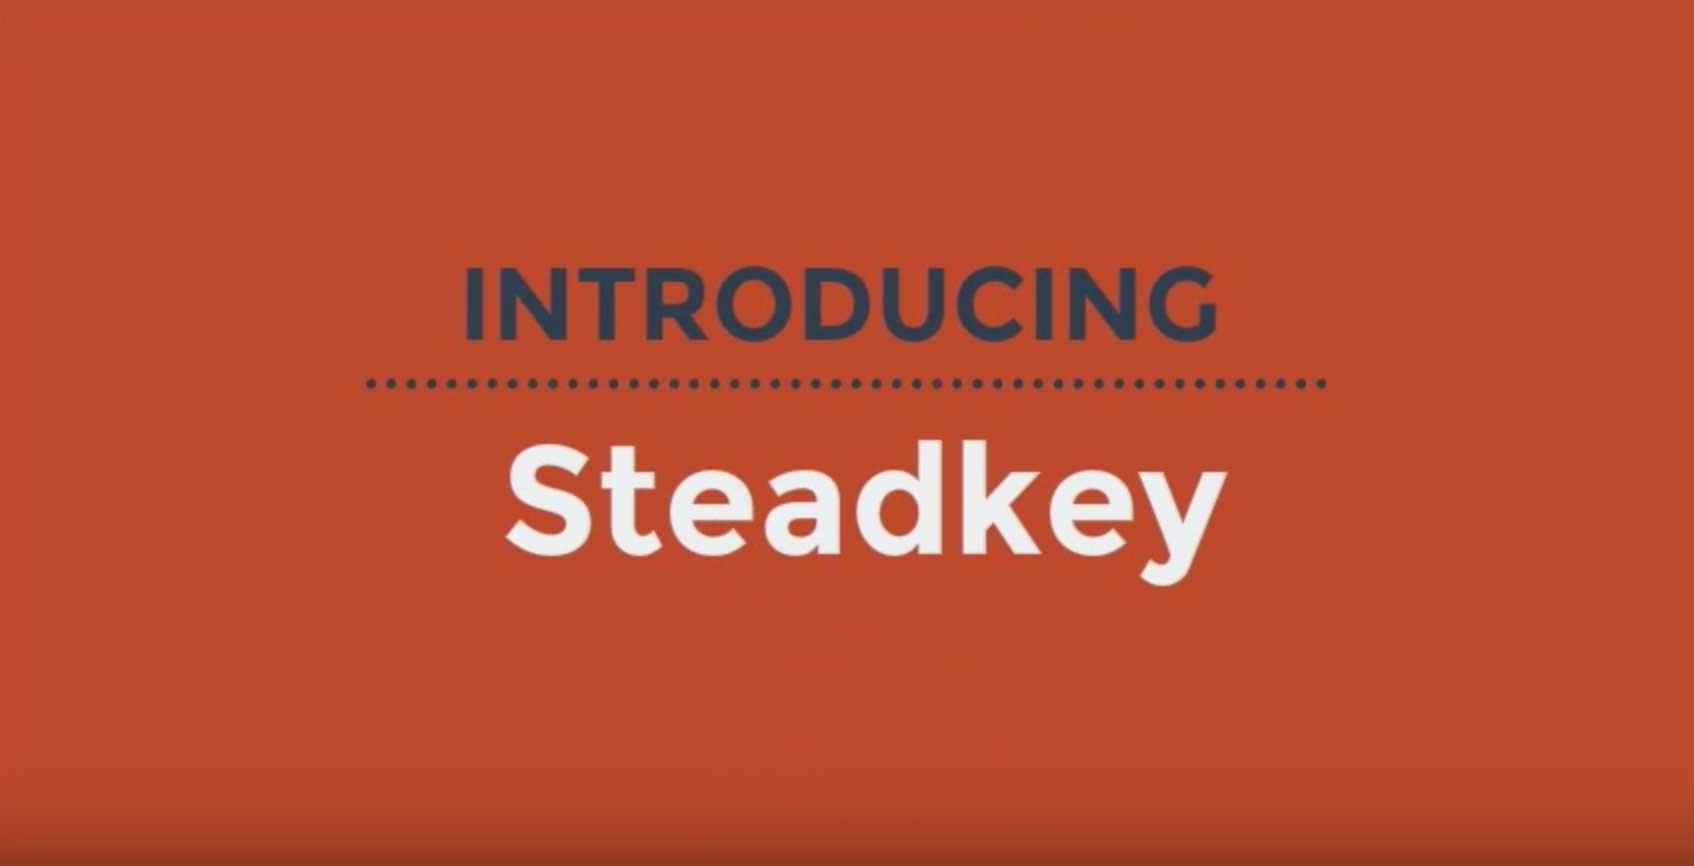 Watch the Steadkey Lenders video